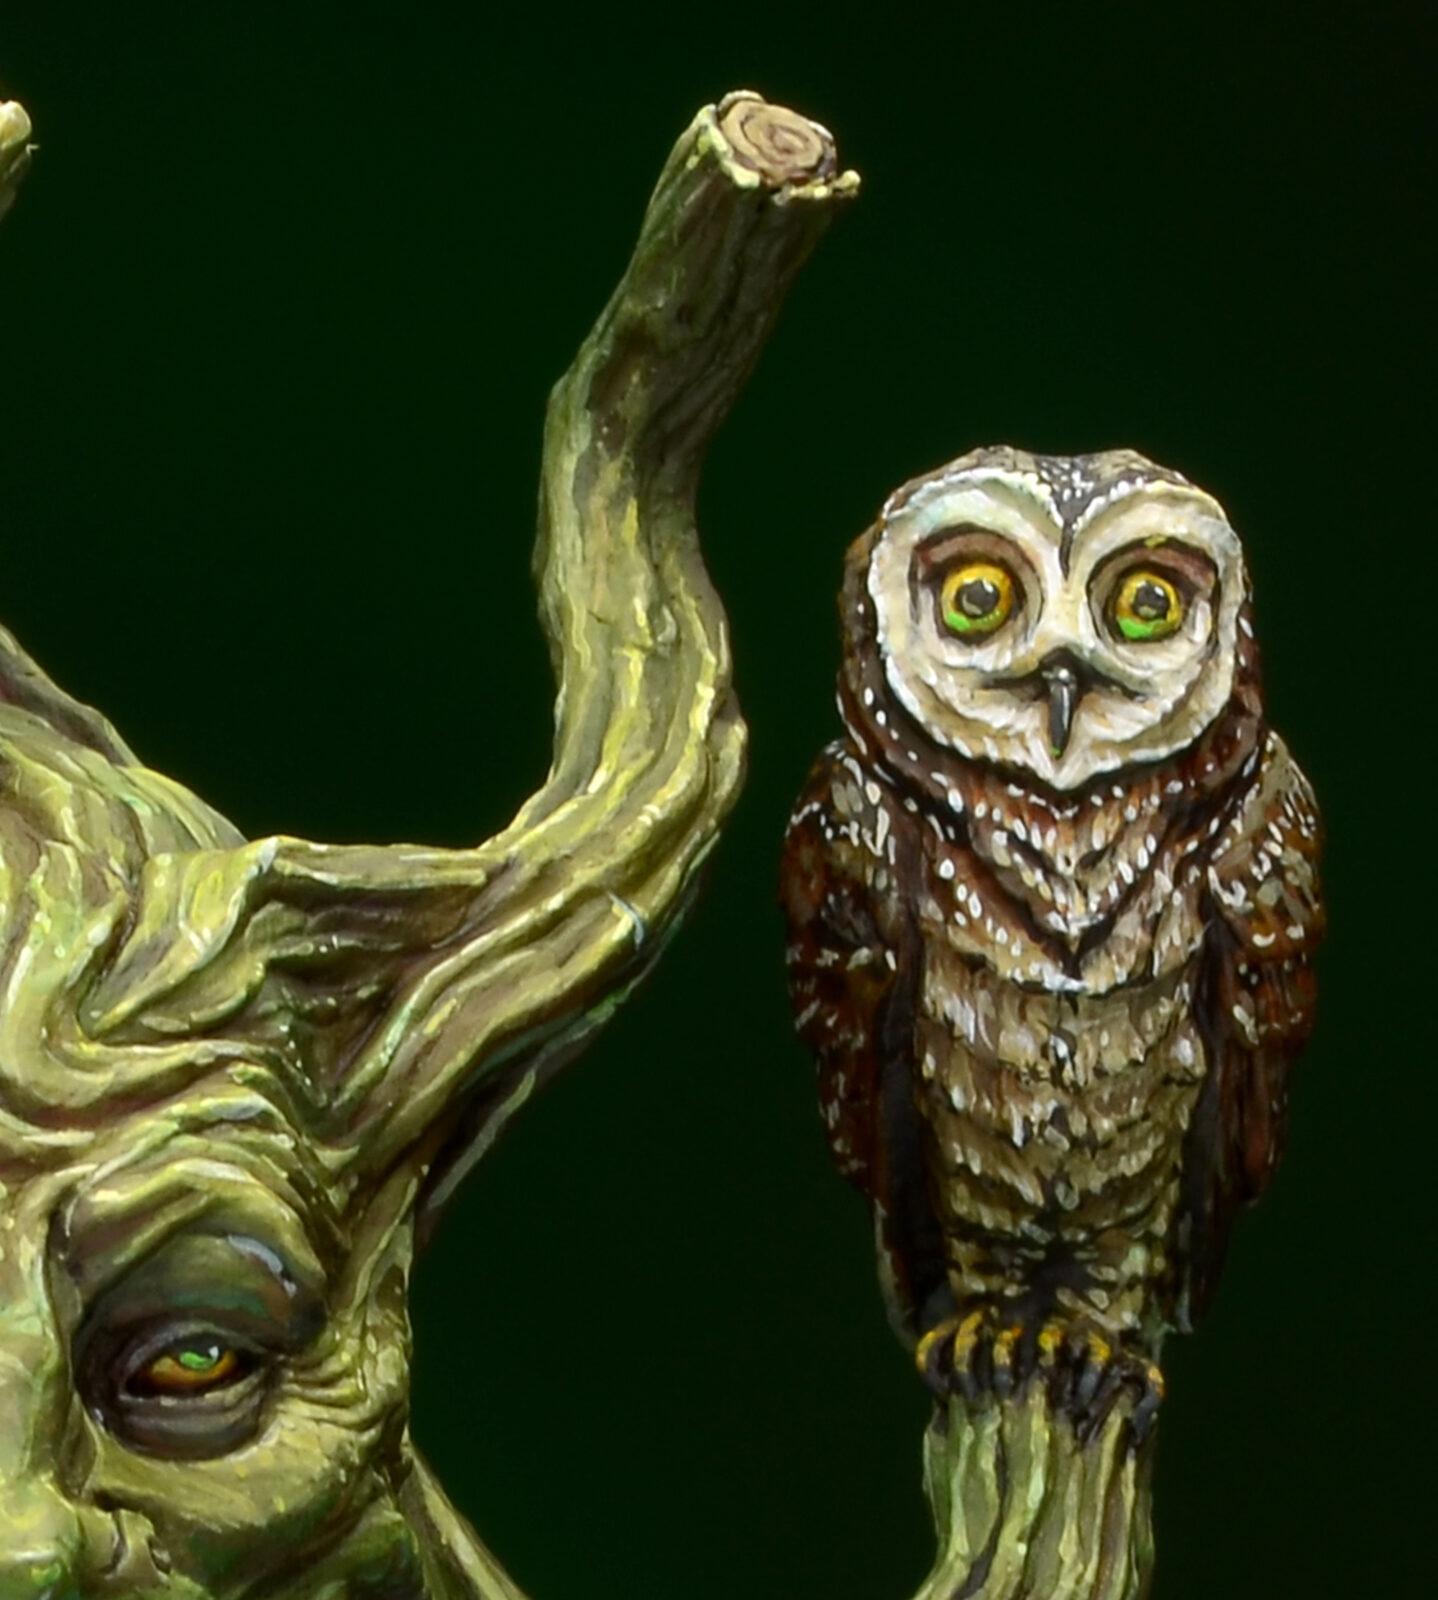 Treeman54